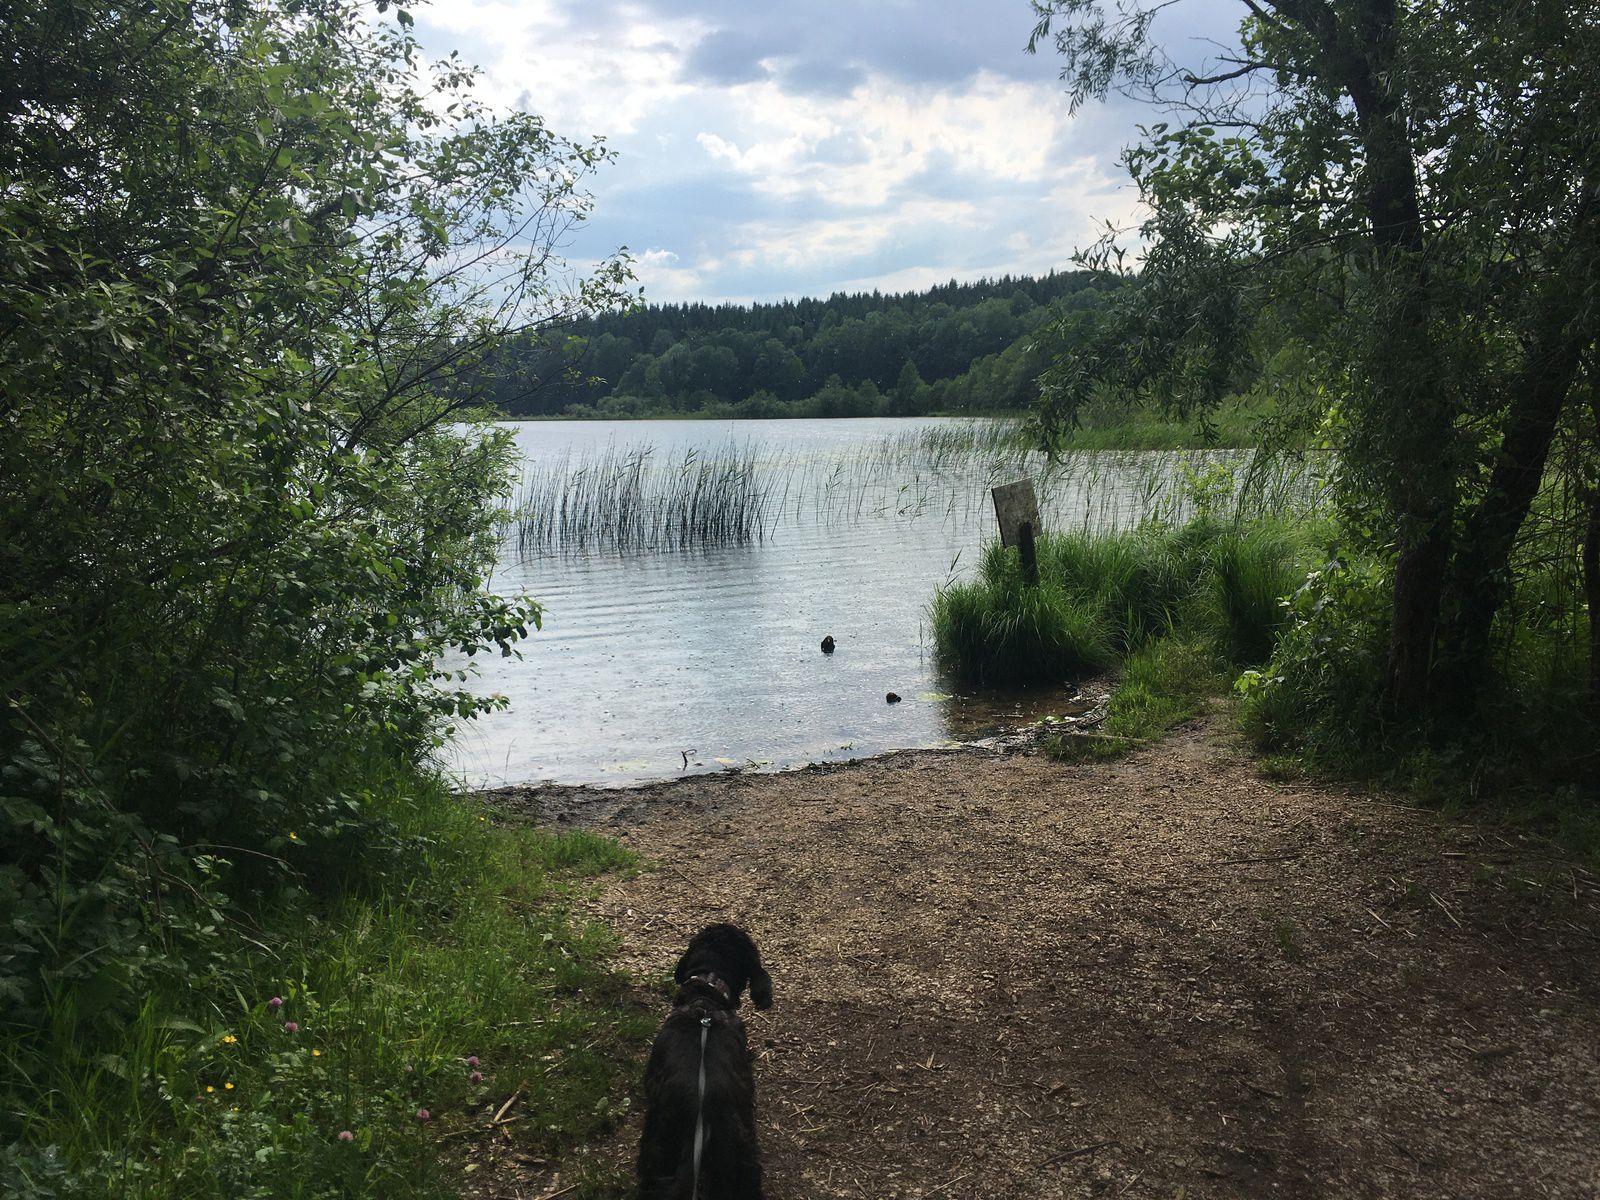 27 juin 2021 : Cravant / Lac du Petit Maclu / Lac du grand Maclu